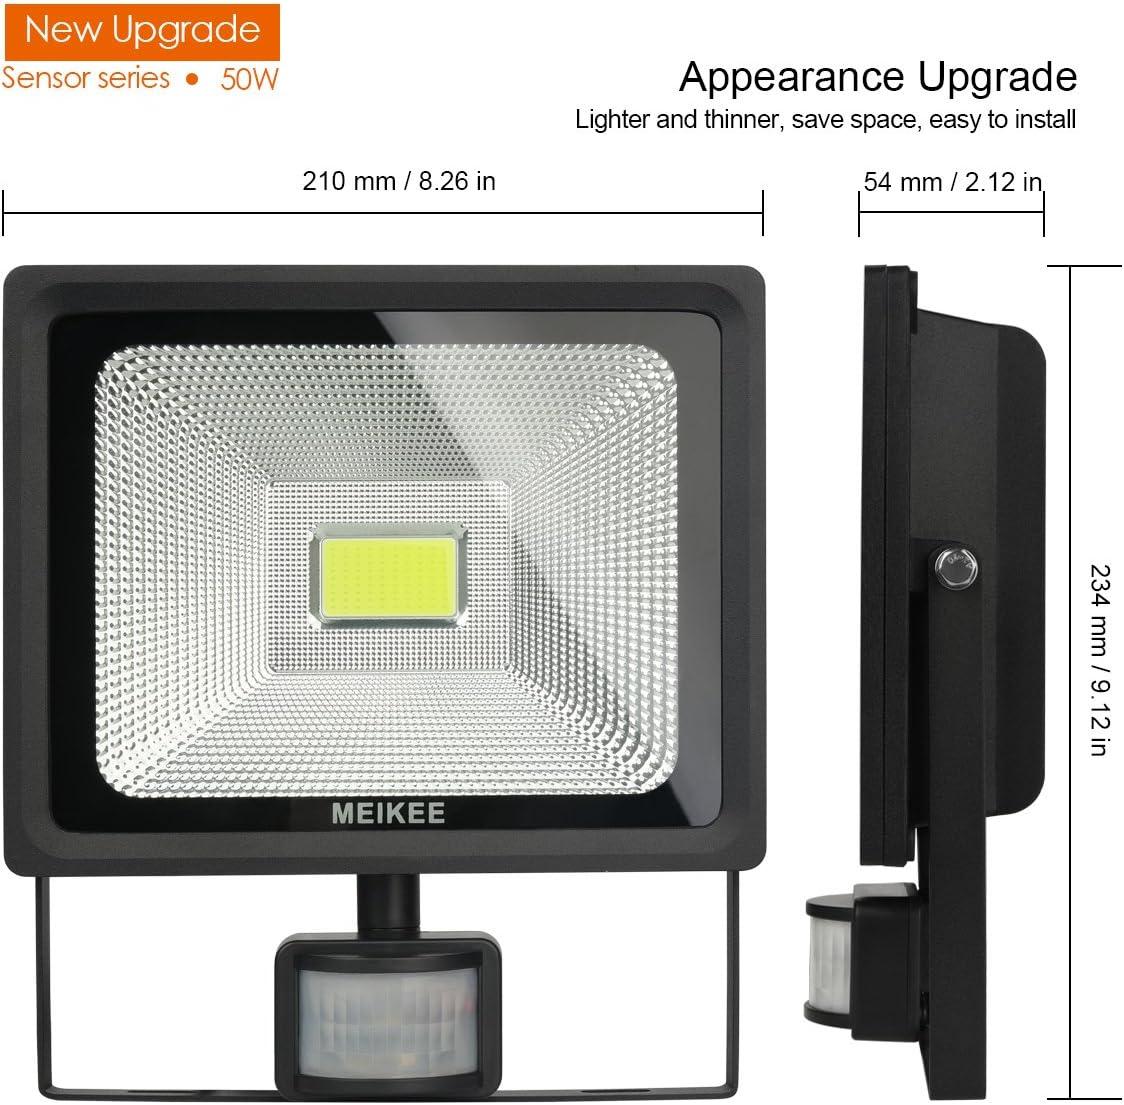 Ideal for Garden 50W Yard and Stairs MEIKEE Motion Sensor Lights Garage LED Motion Sensor Light Outdoor Flood Light with Motion Sensor